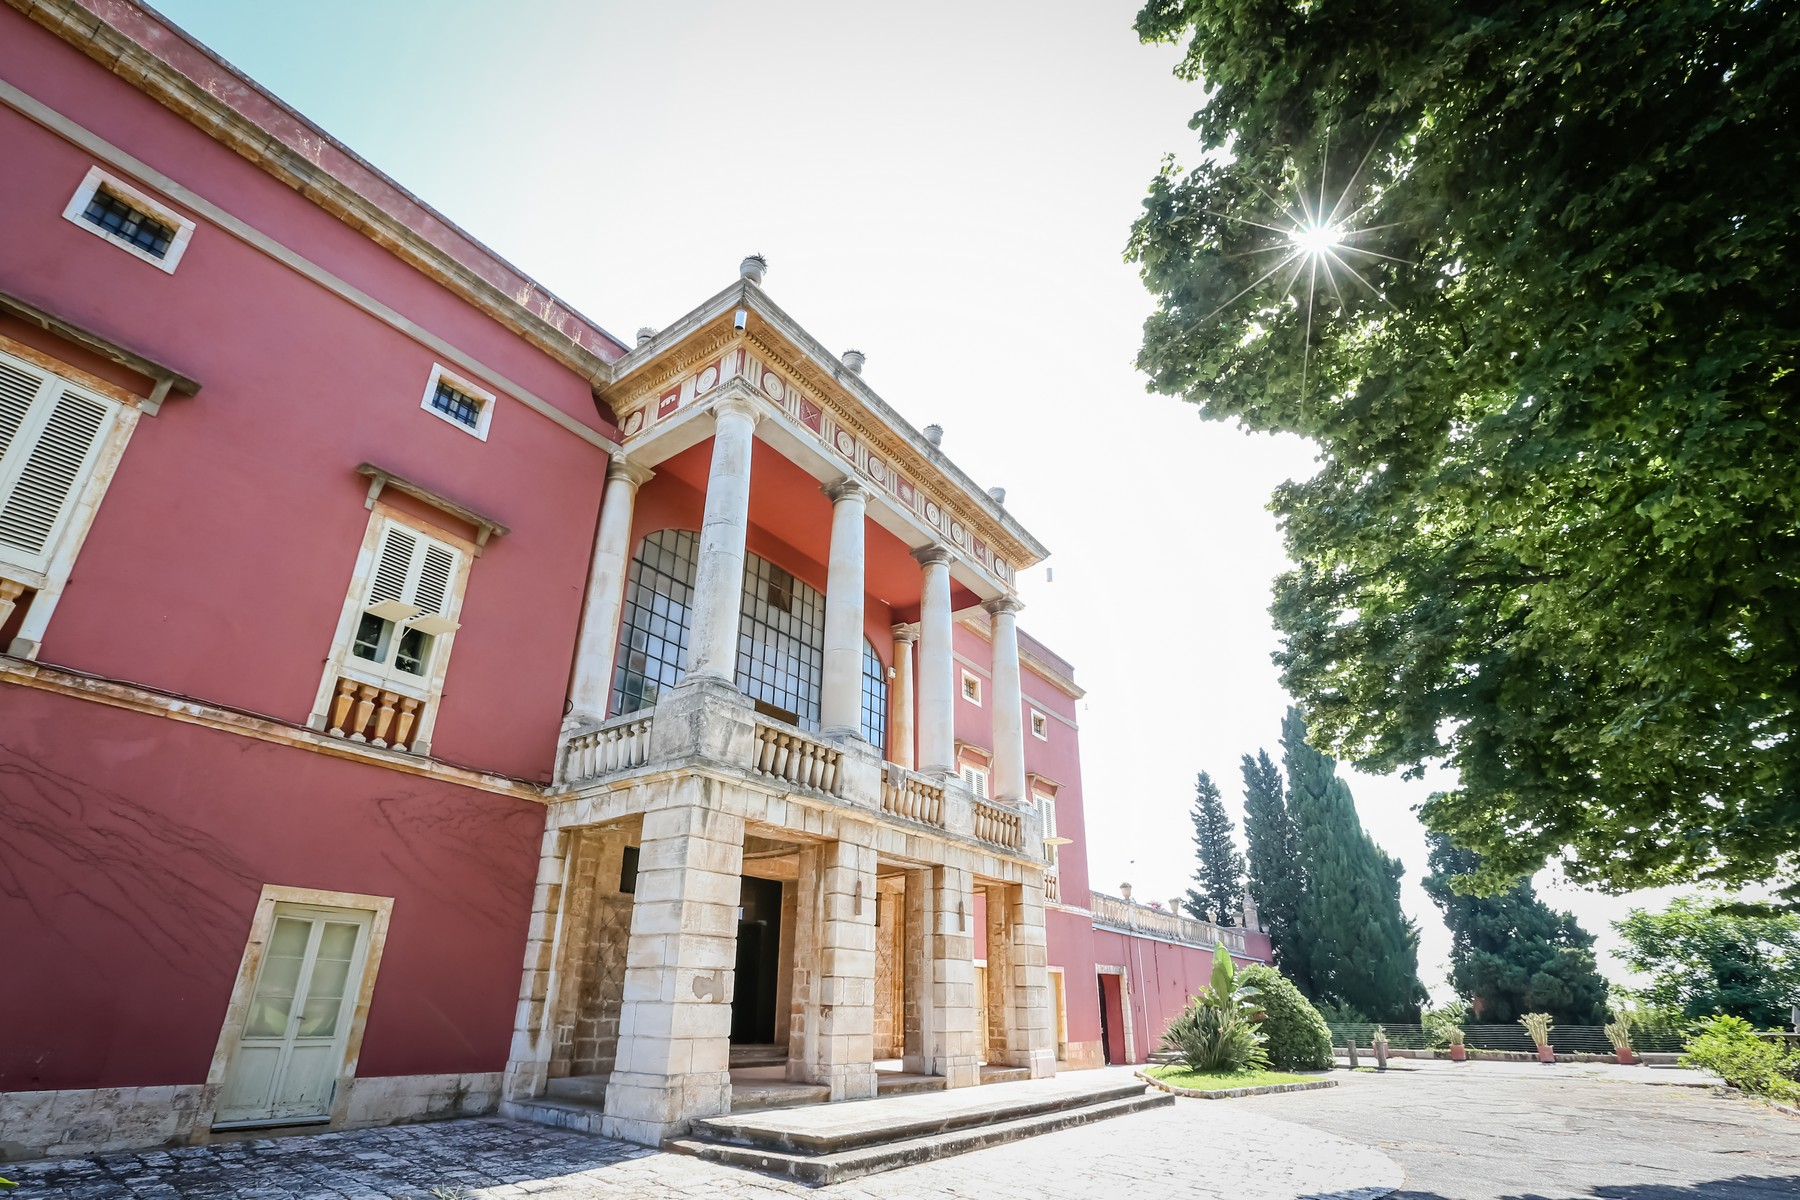 Einfamilienhaus für Verkauf beim Villa Meo Evoli Contrada S. Oceano Monopoli, Bari 70043 Italien